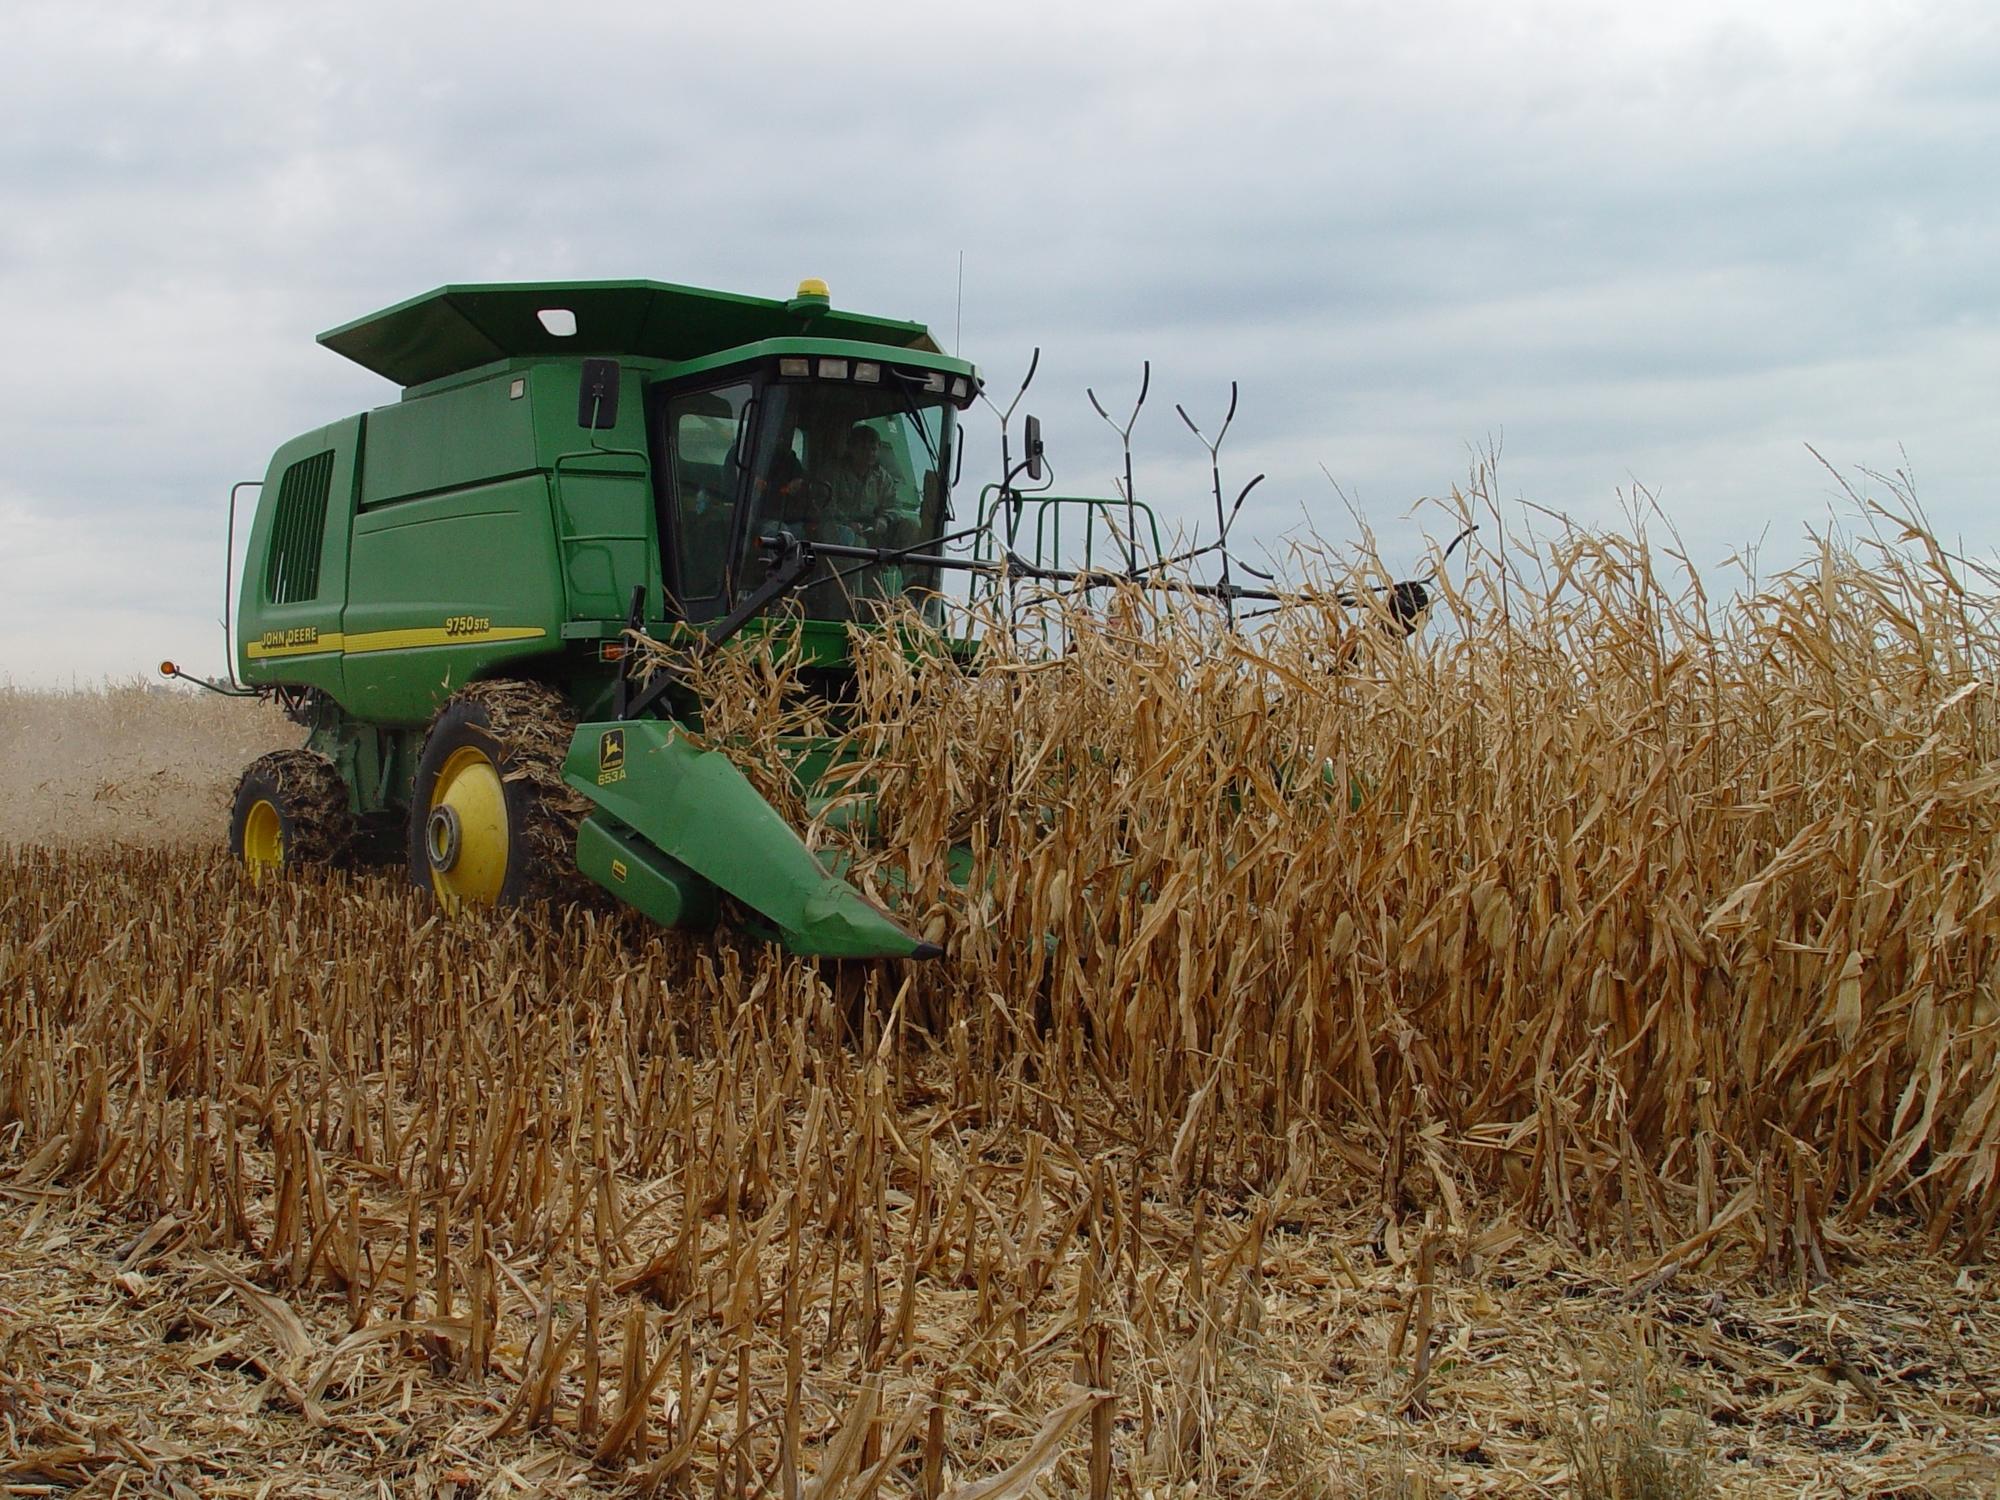 Corn stover